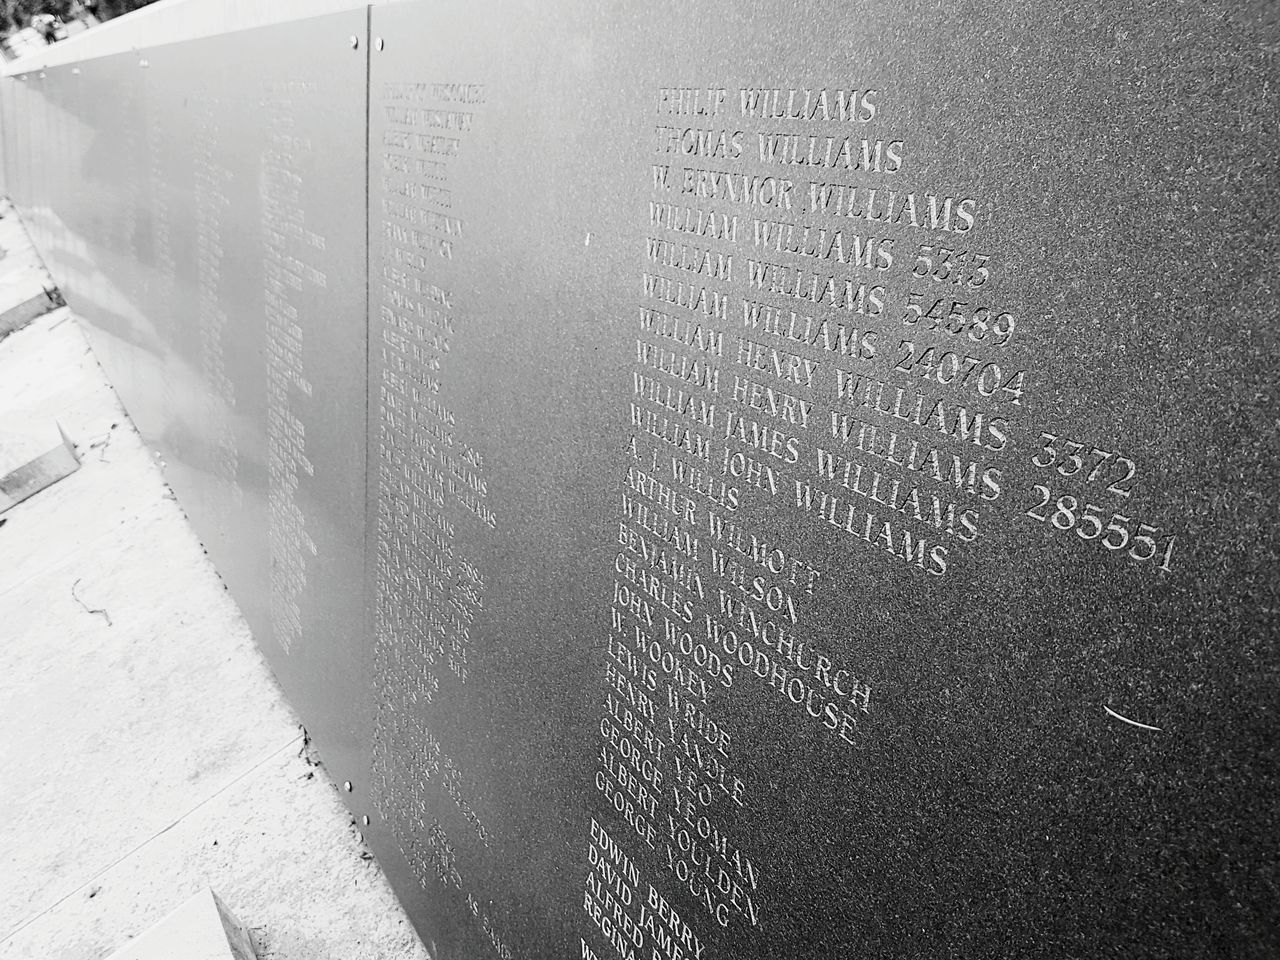 Fallen but unforgotten Day No People Outdoors Built Structure Fallen Heroes Honour Honor War Memorial War Remembrance Names Listed